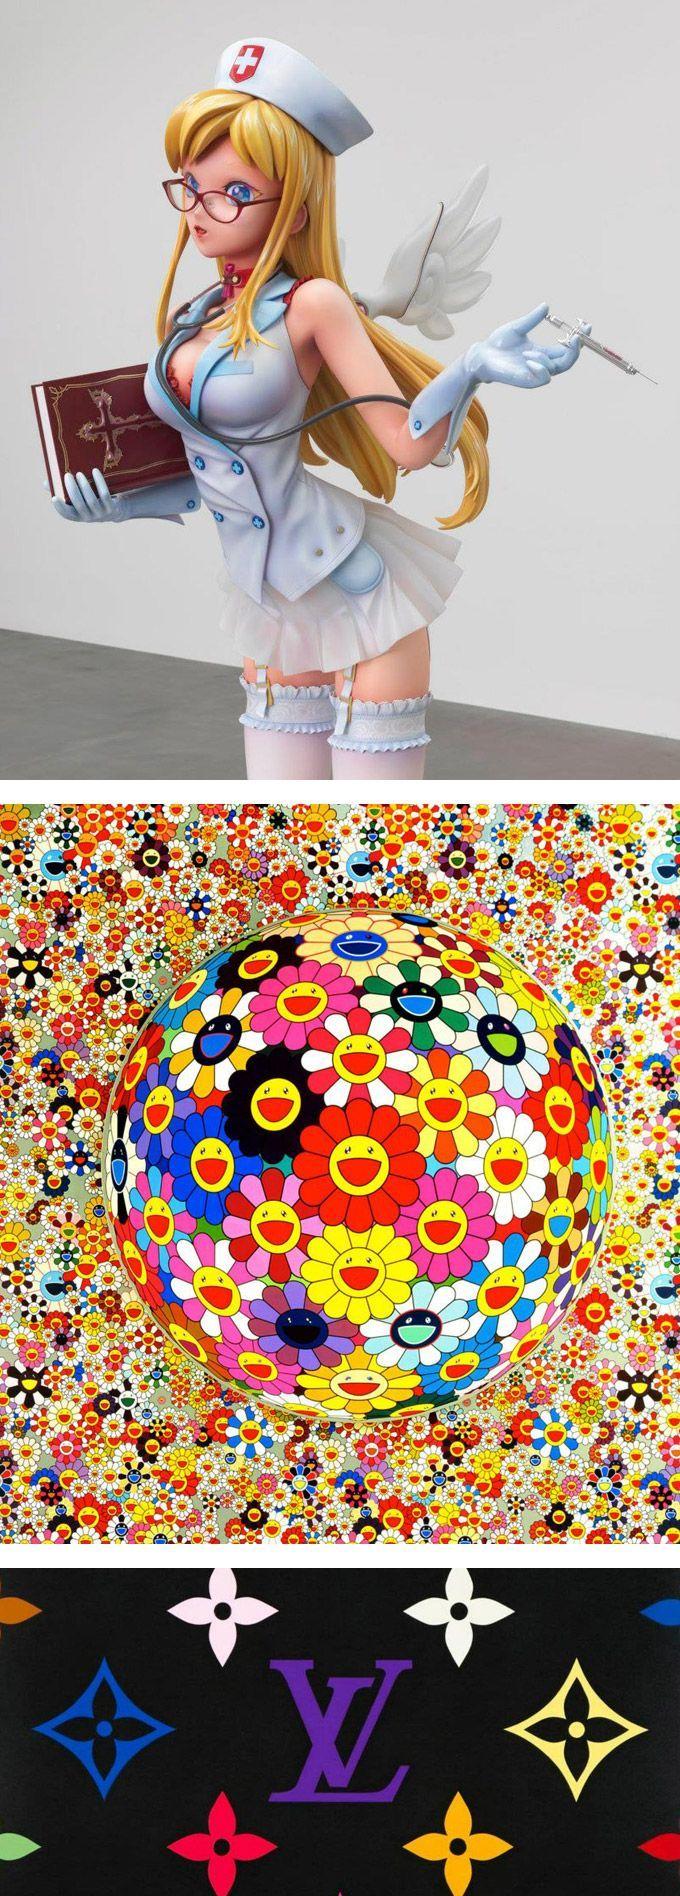 Takashi murakami sun flowers and contemporary art uniqlog - Takashi Murakami L Artista Del Superflat